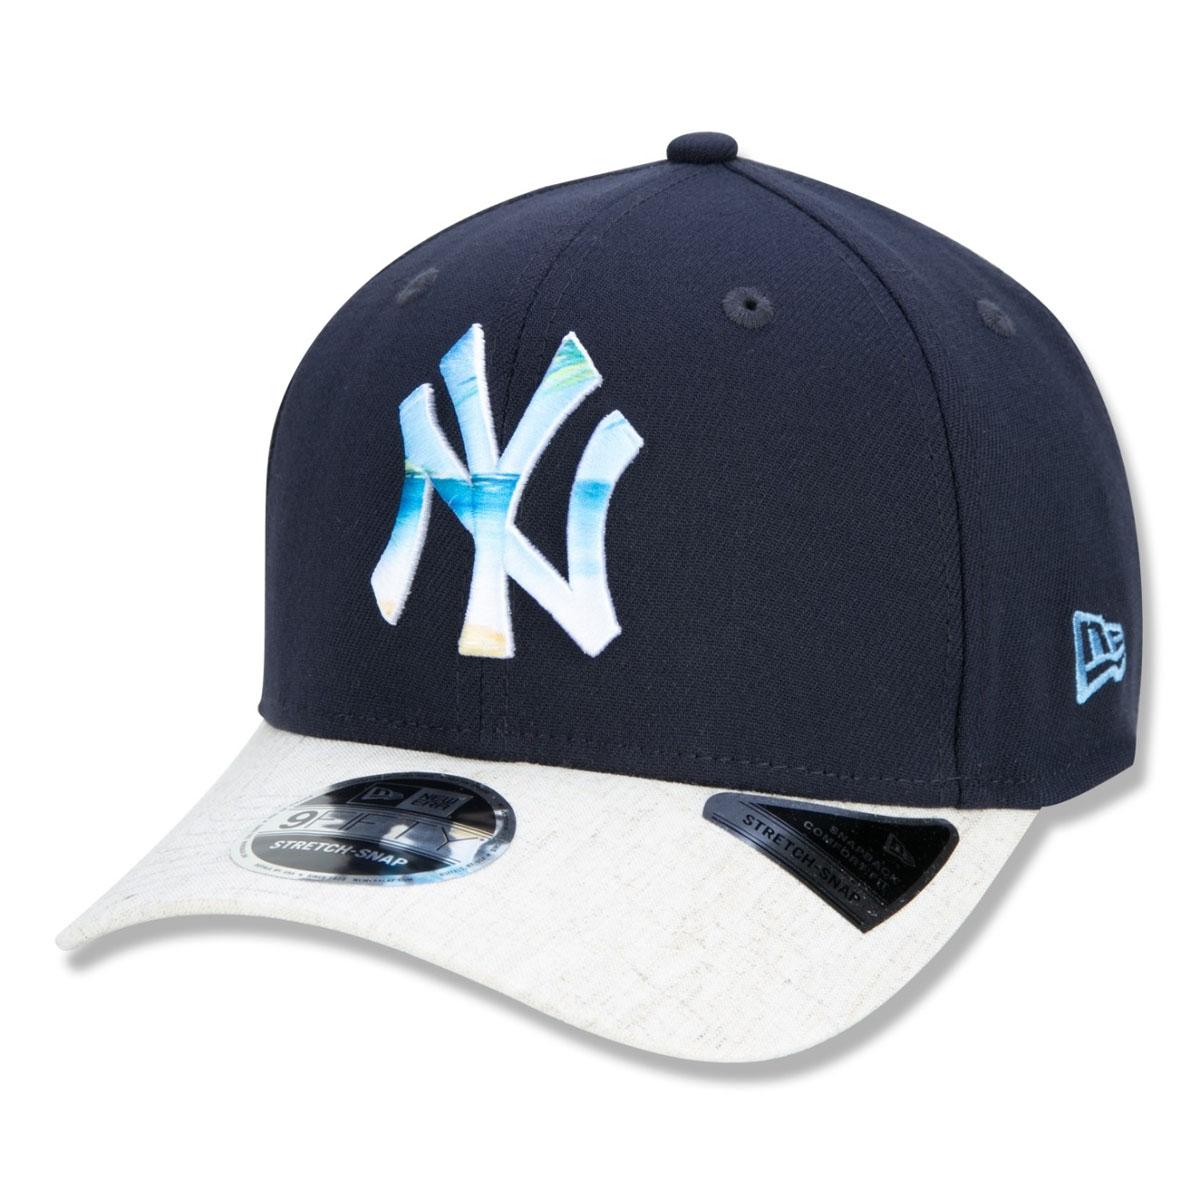 Boné New Era Yankees Hawaii Vibes Ocean